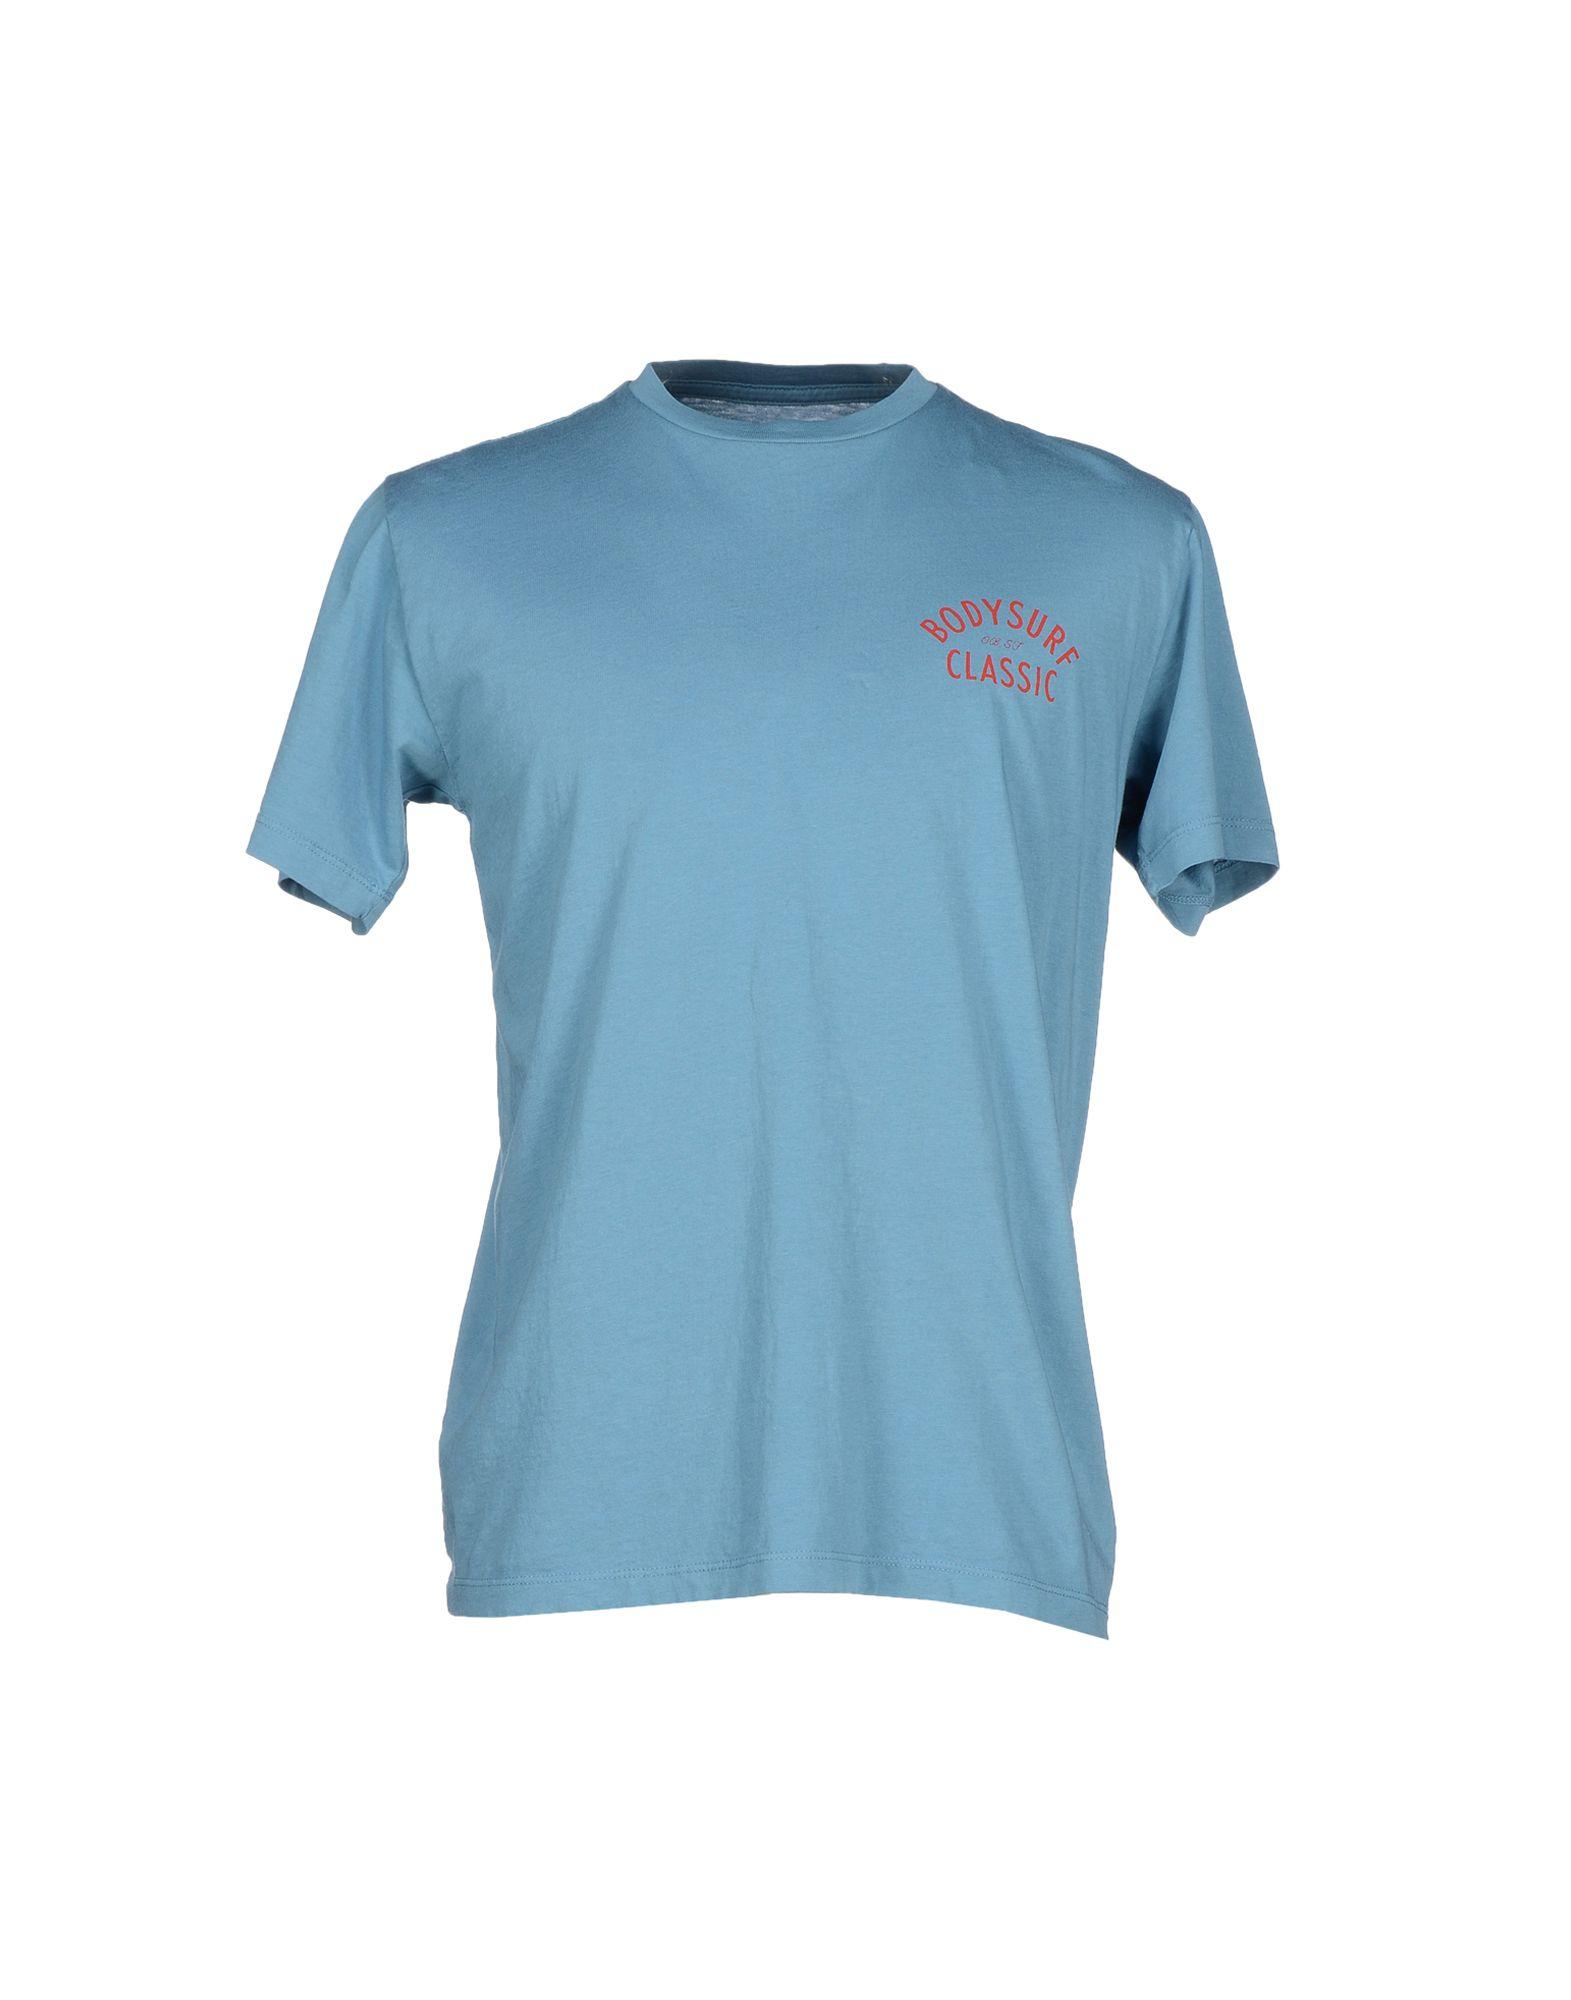 MOLLUSK T-Shirt in Pastel Blue